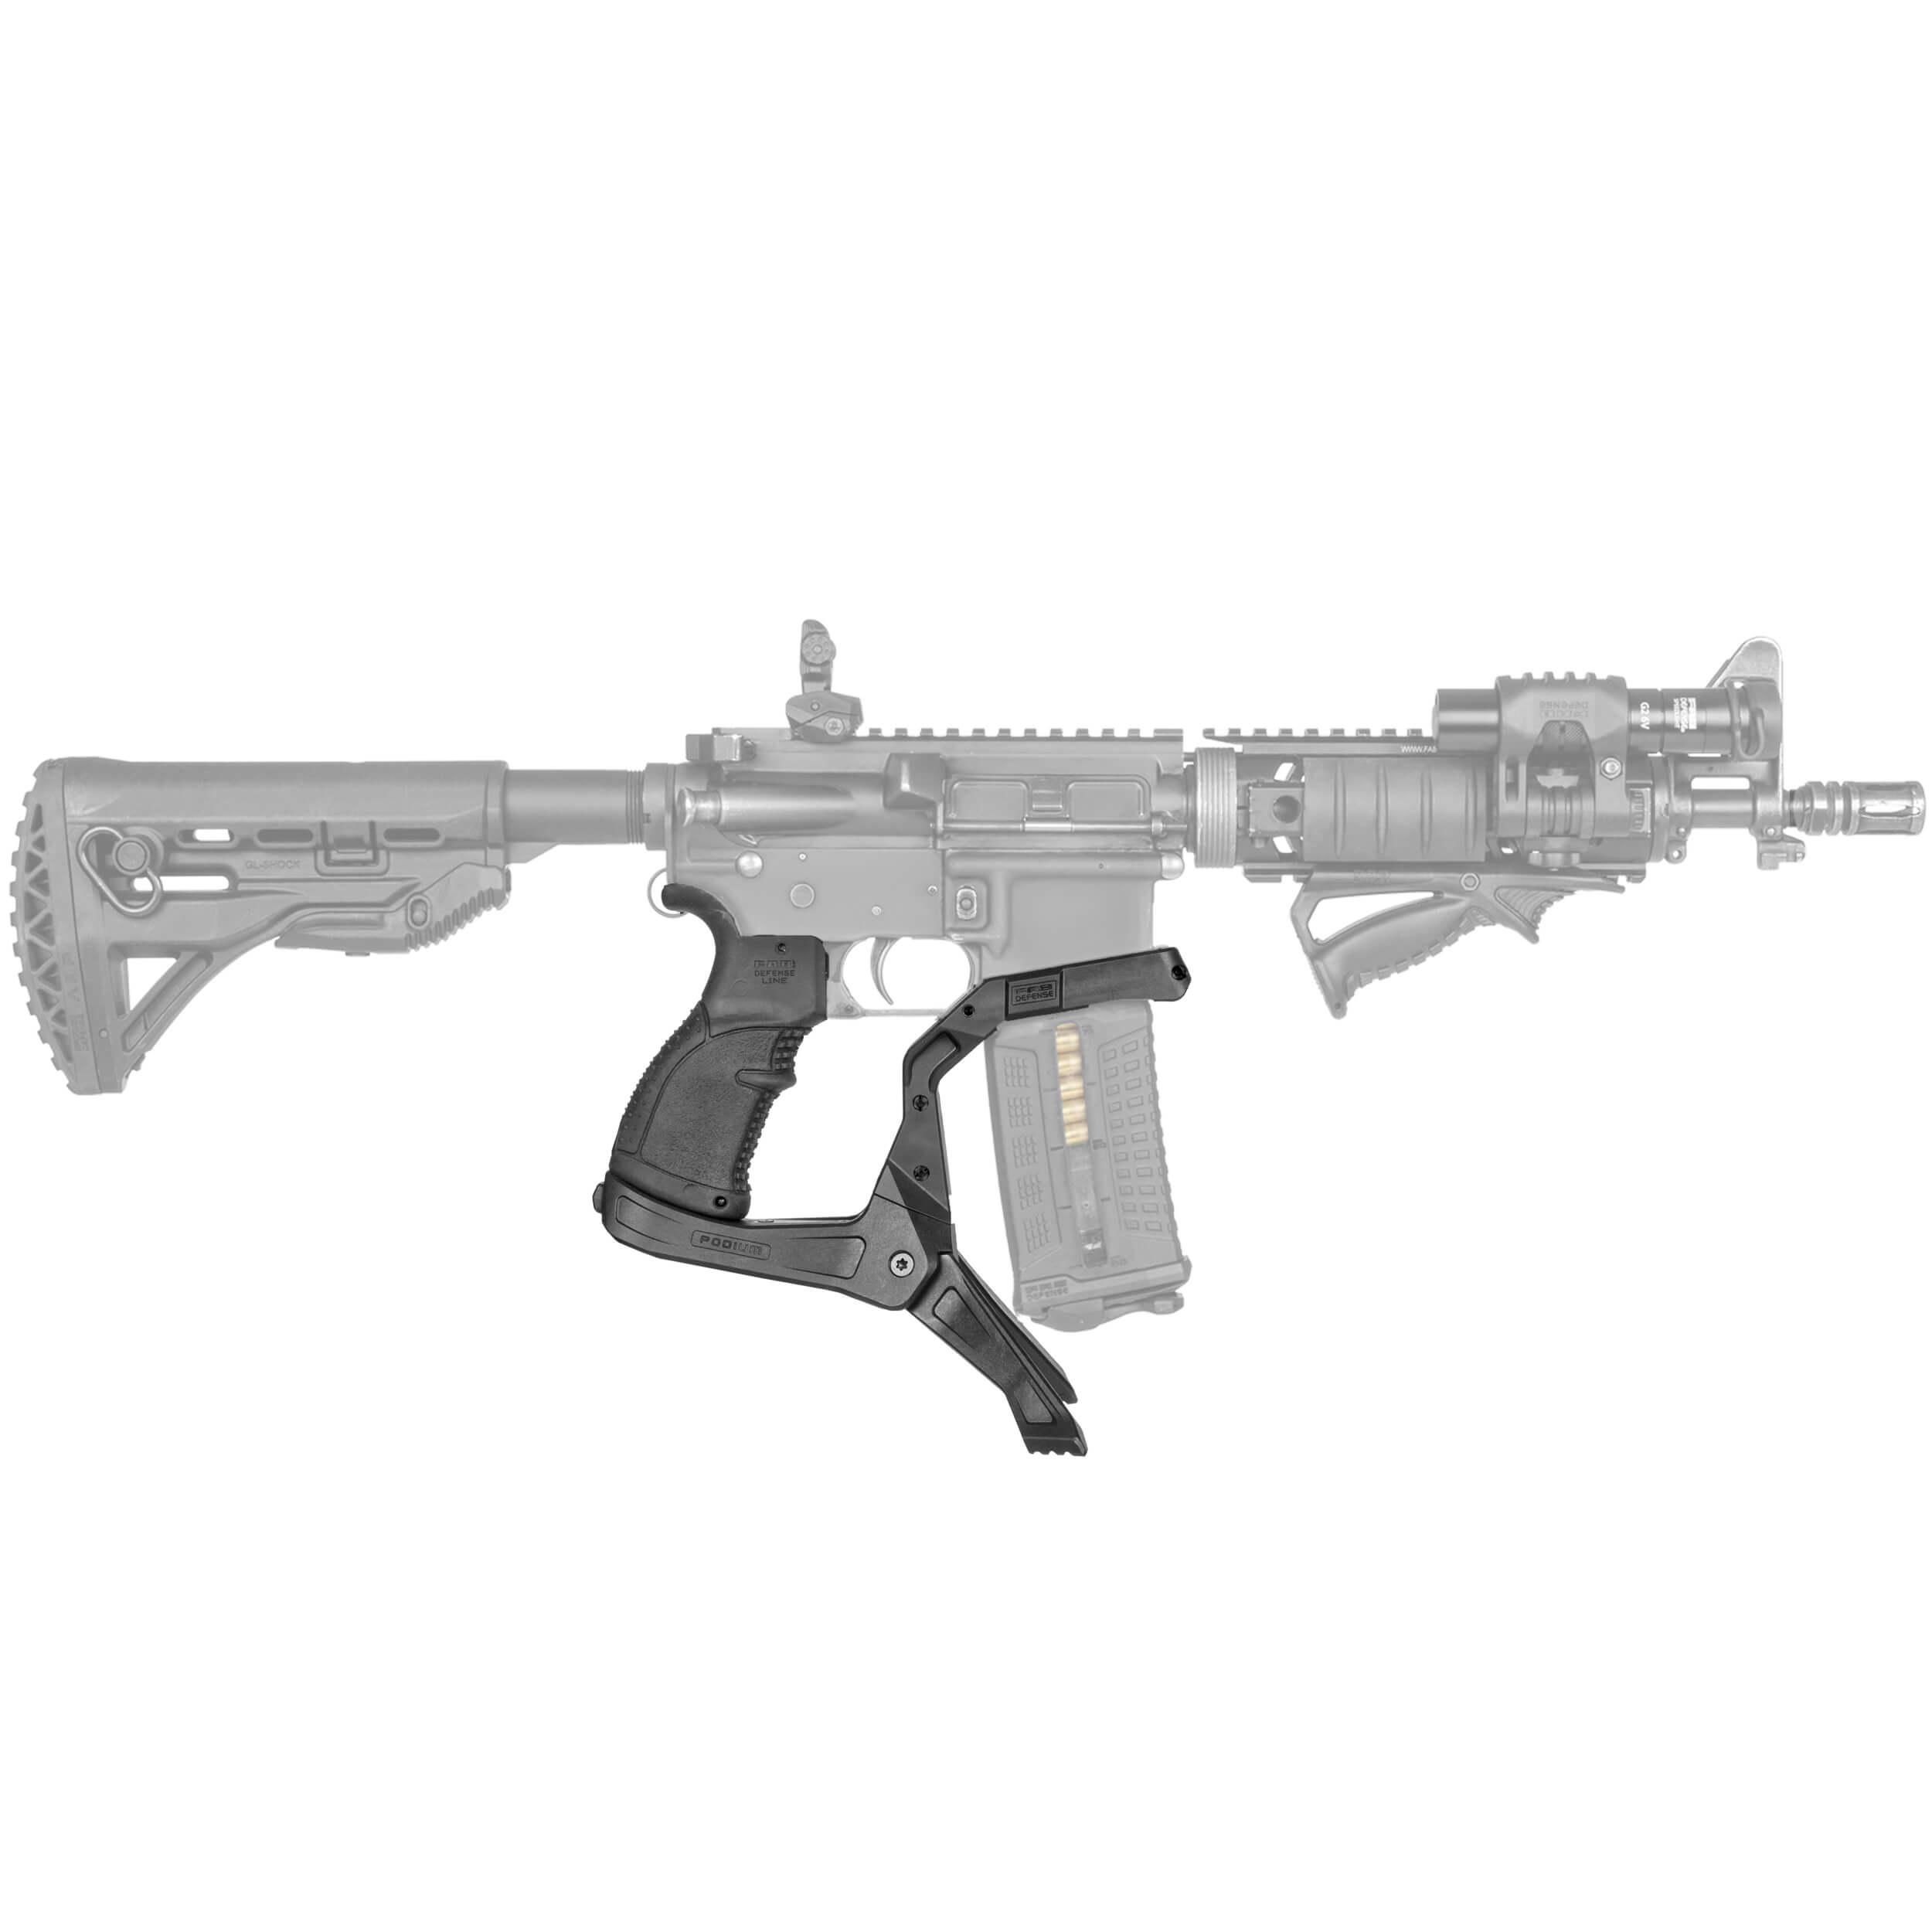 AR-Podium Pistolgrip Bipod for M16 / M4 / AR-15